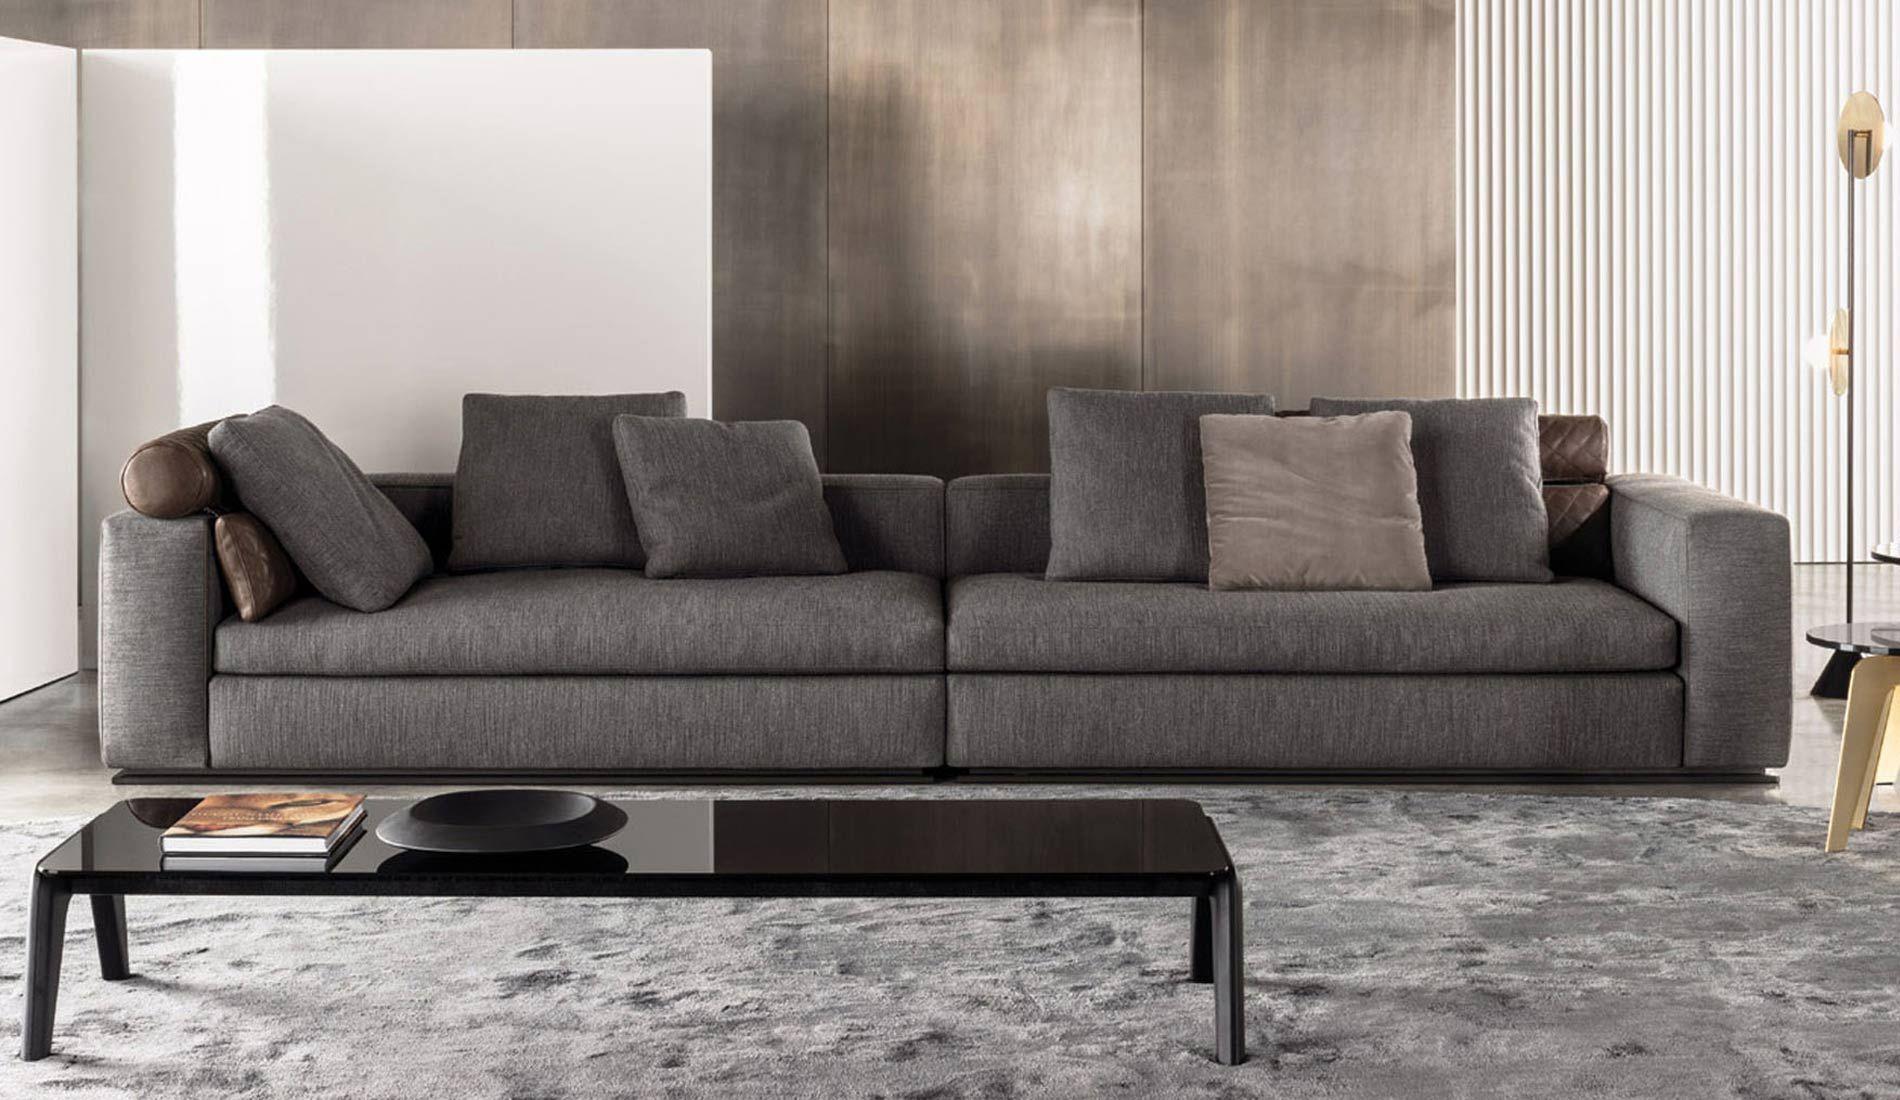 Minotti Sofa Taraba Home Review